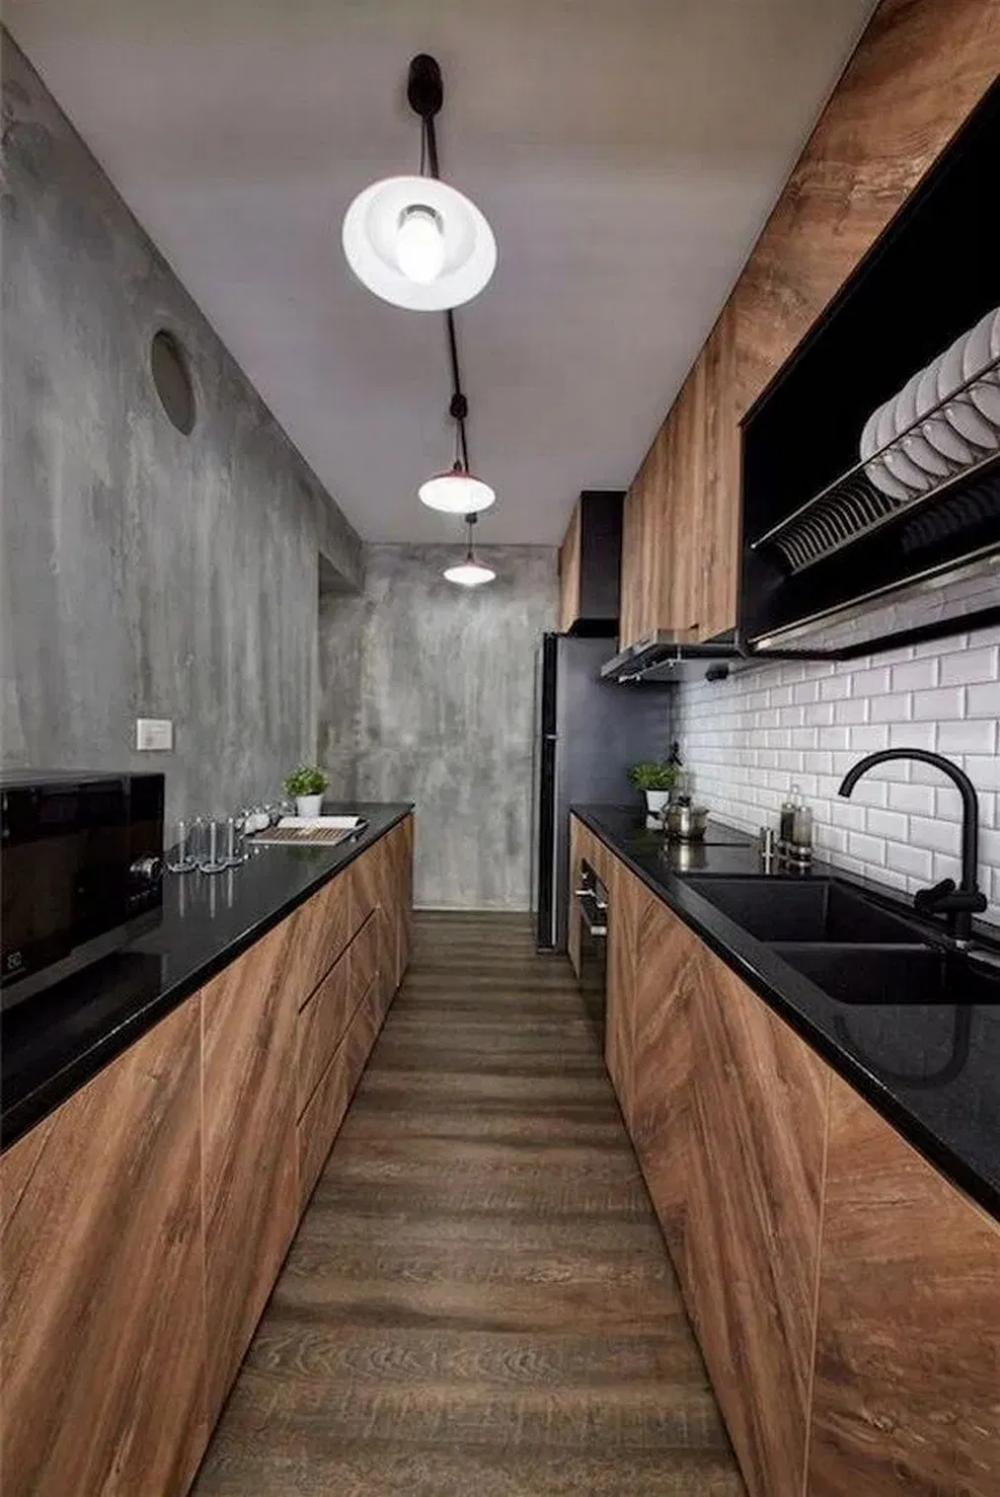 50 amazing black kitchen design ideas 2020 17 (With images